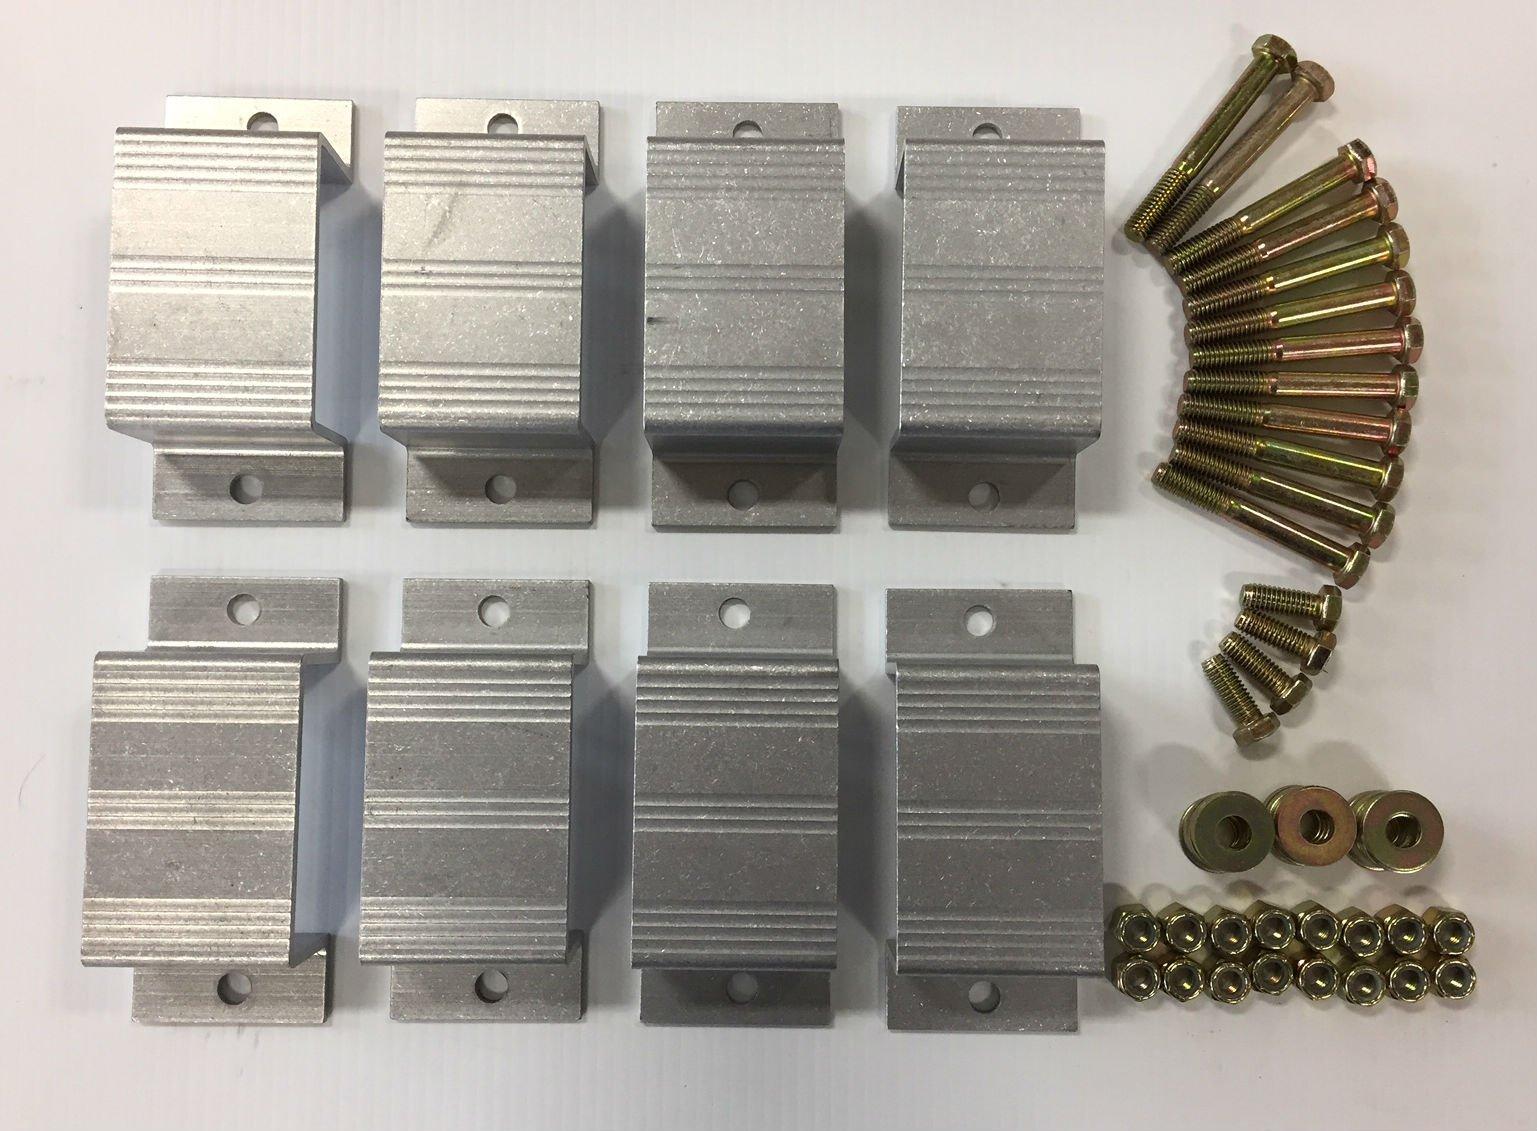 Triton 07110 XTV Trailer Stake Pocket Kit with 8 Pockets